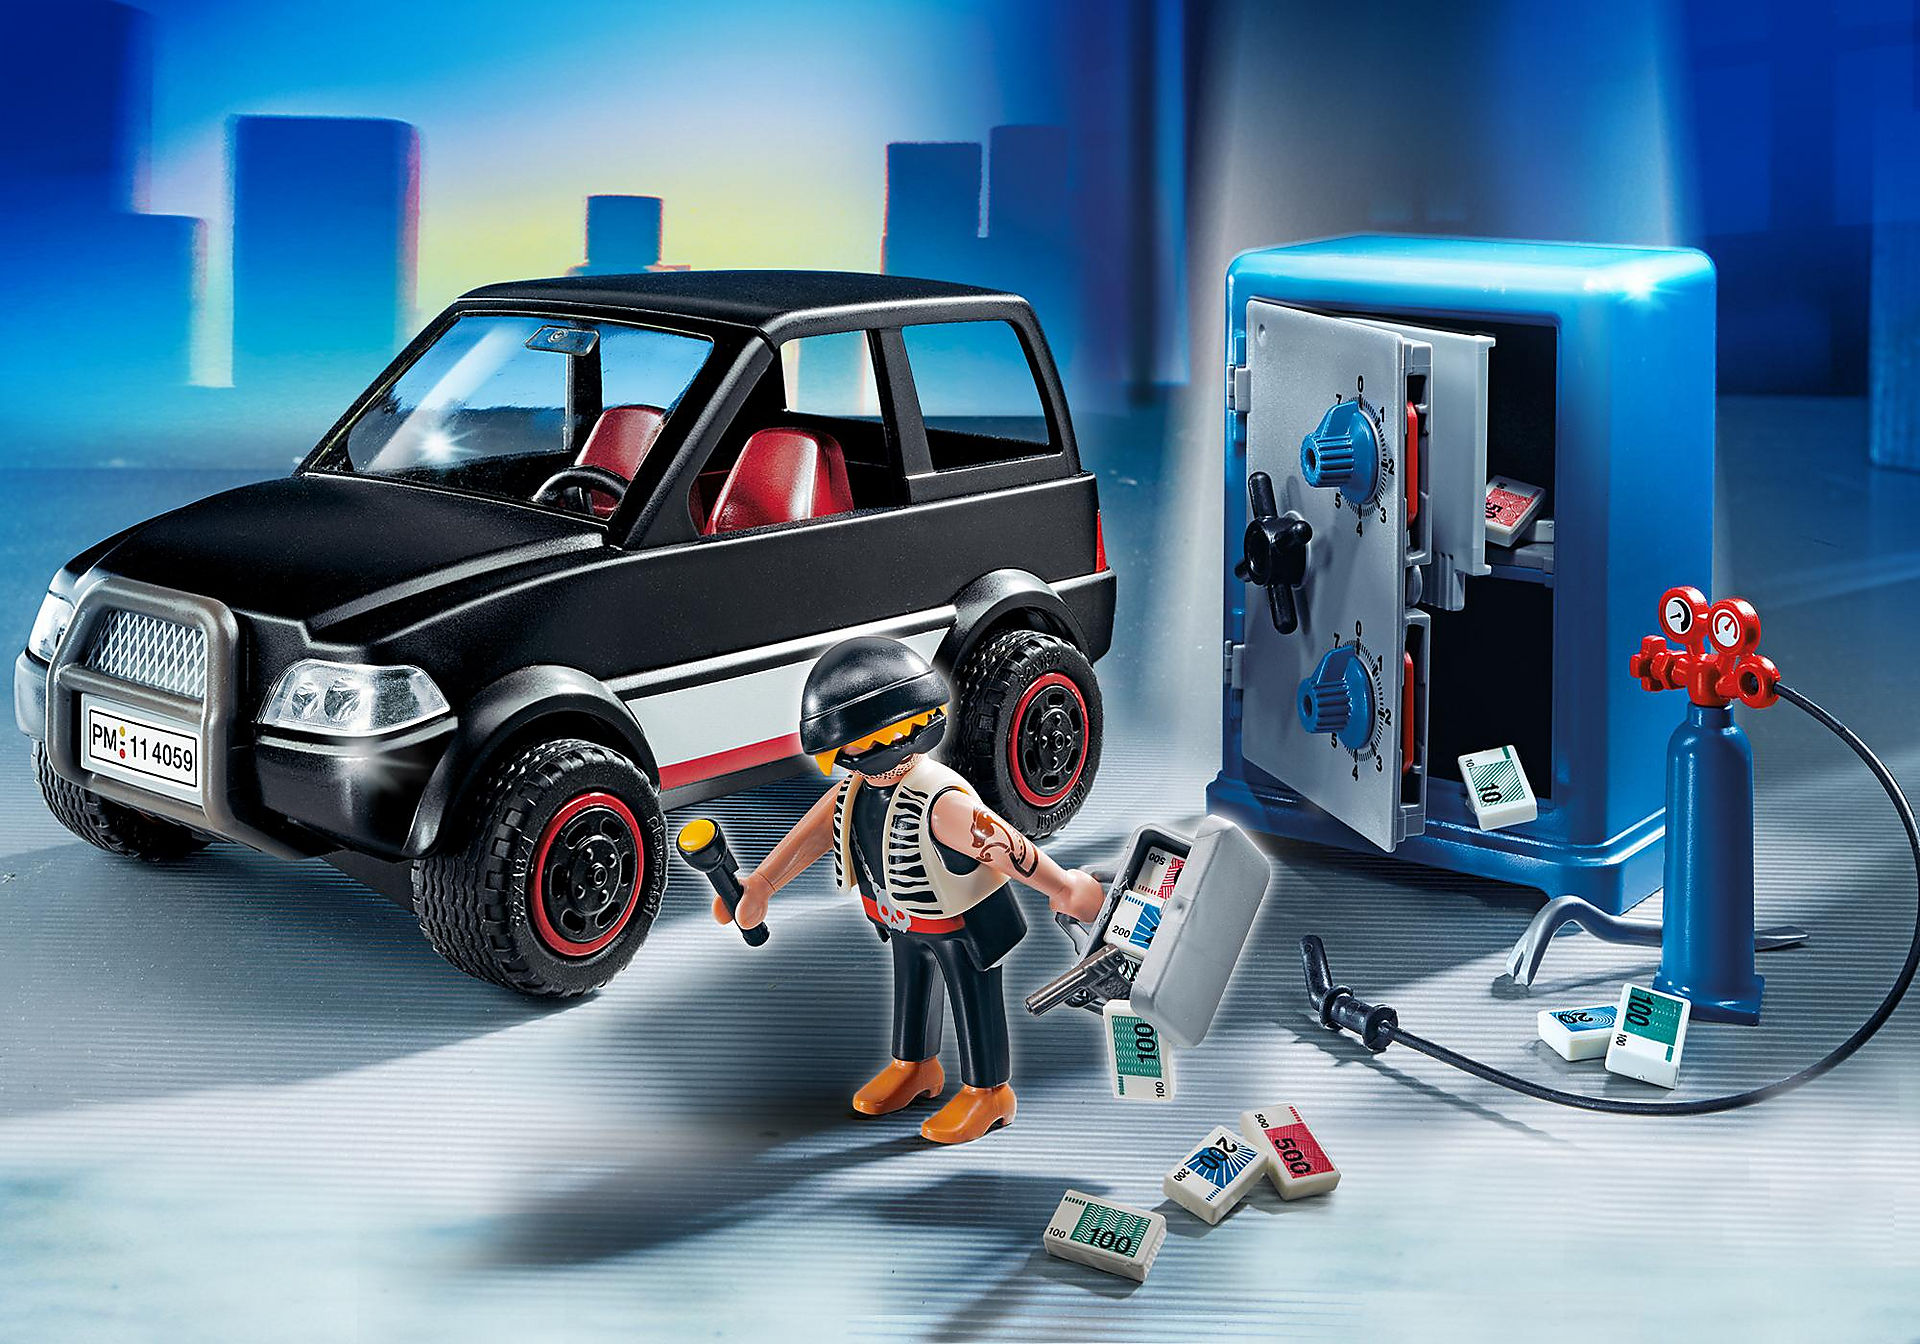 http://media.playmobil.com/i/playmobil/4059_product_detail/Brandkastkraker met vluchtauto